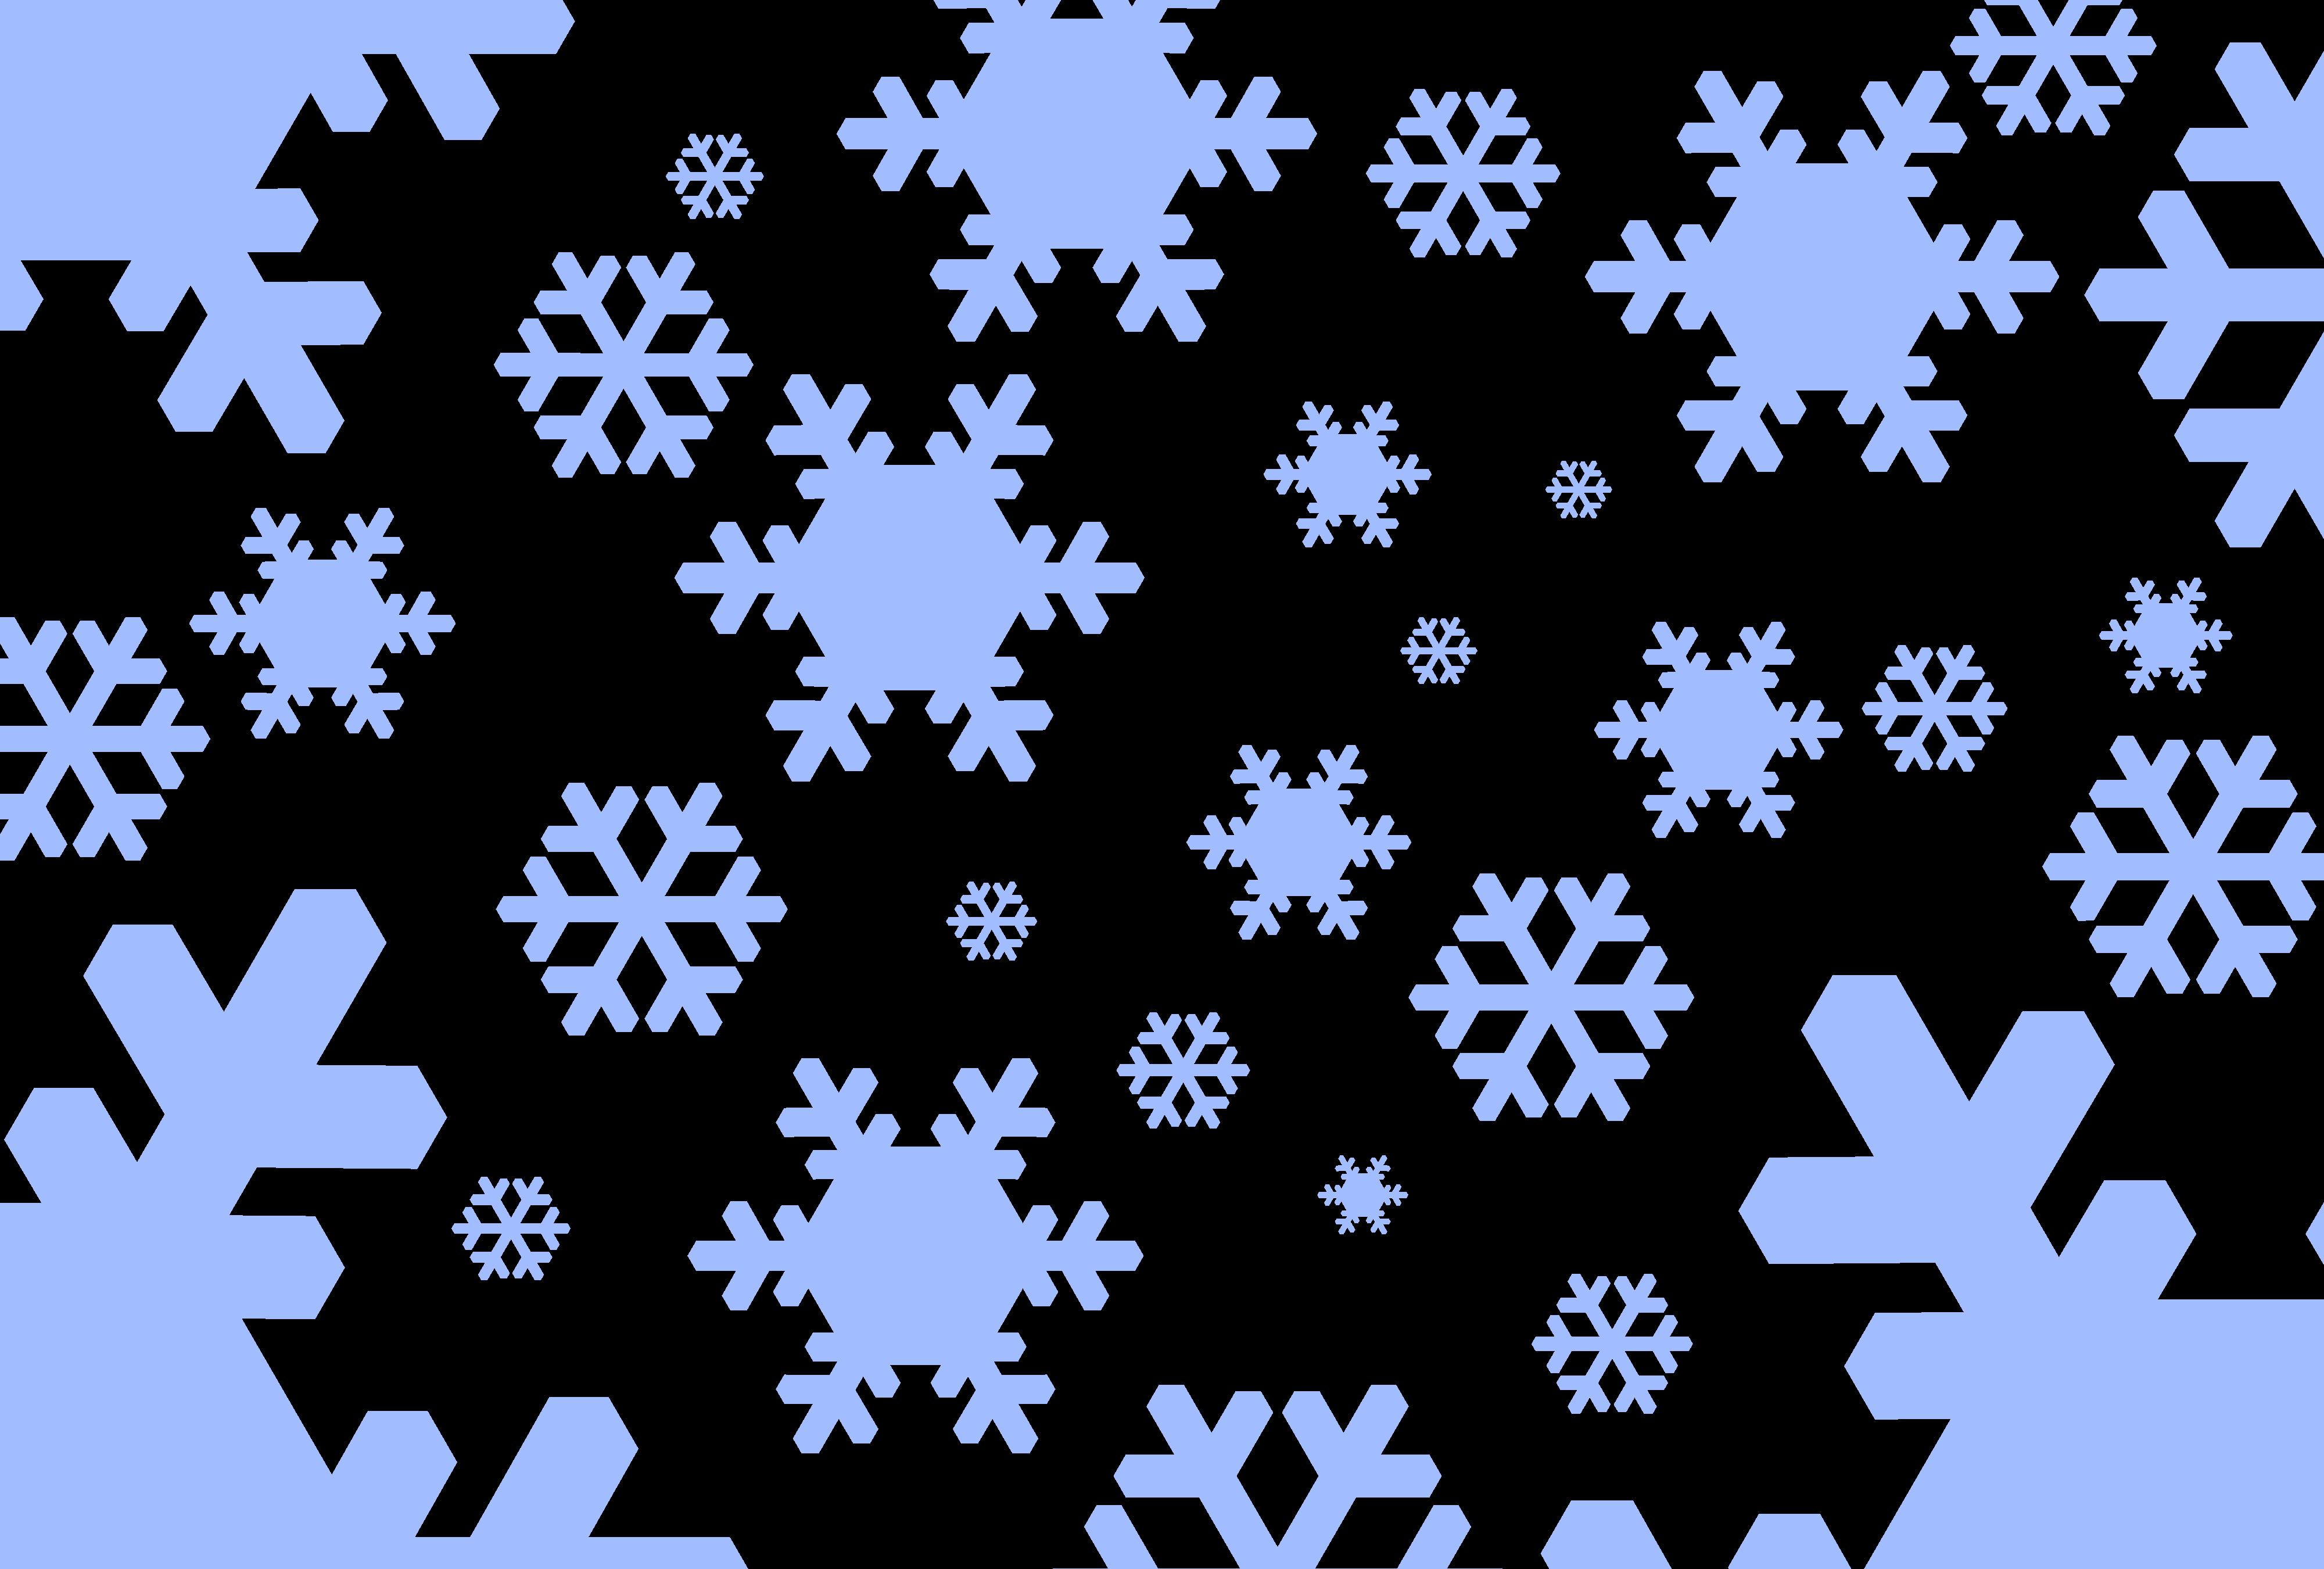 Drawn snow Stock symbols themed freeimageslive Photo